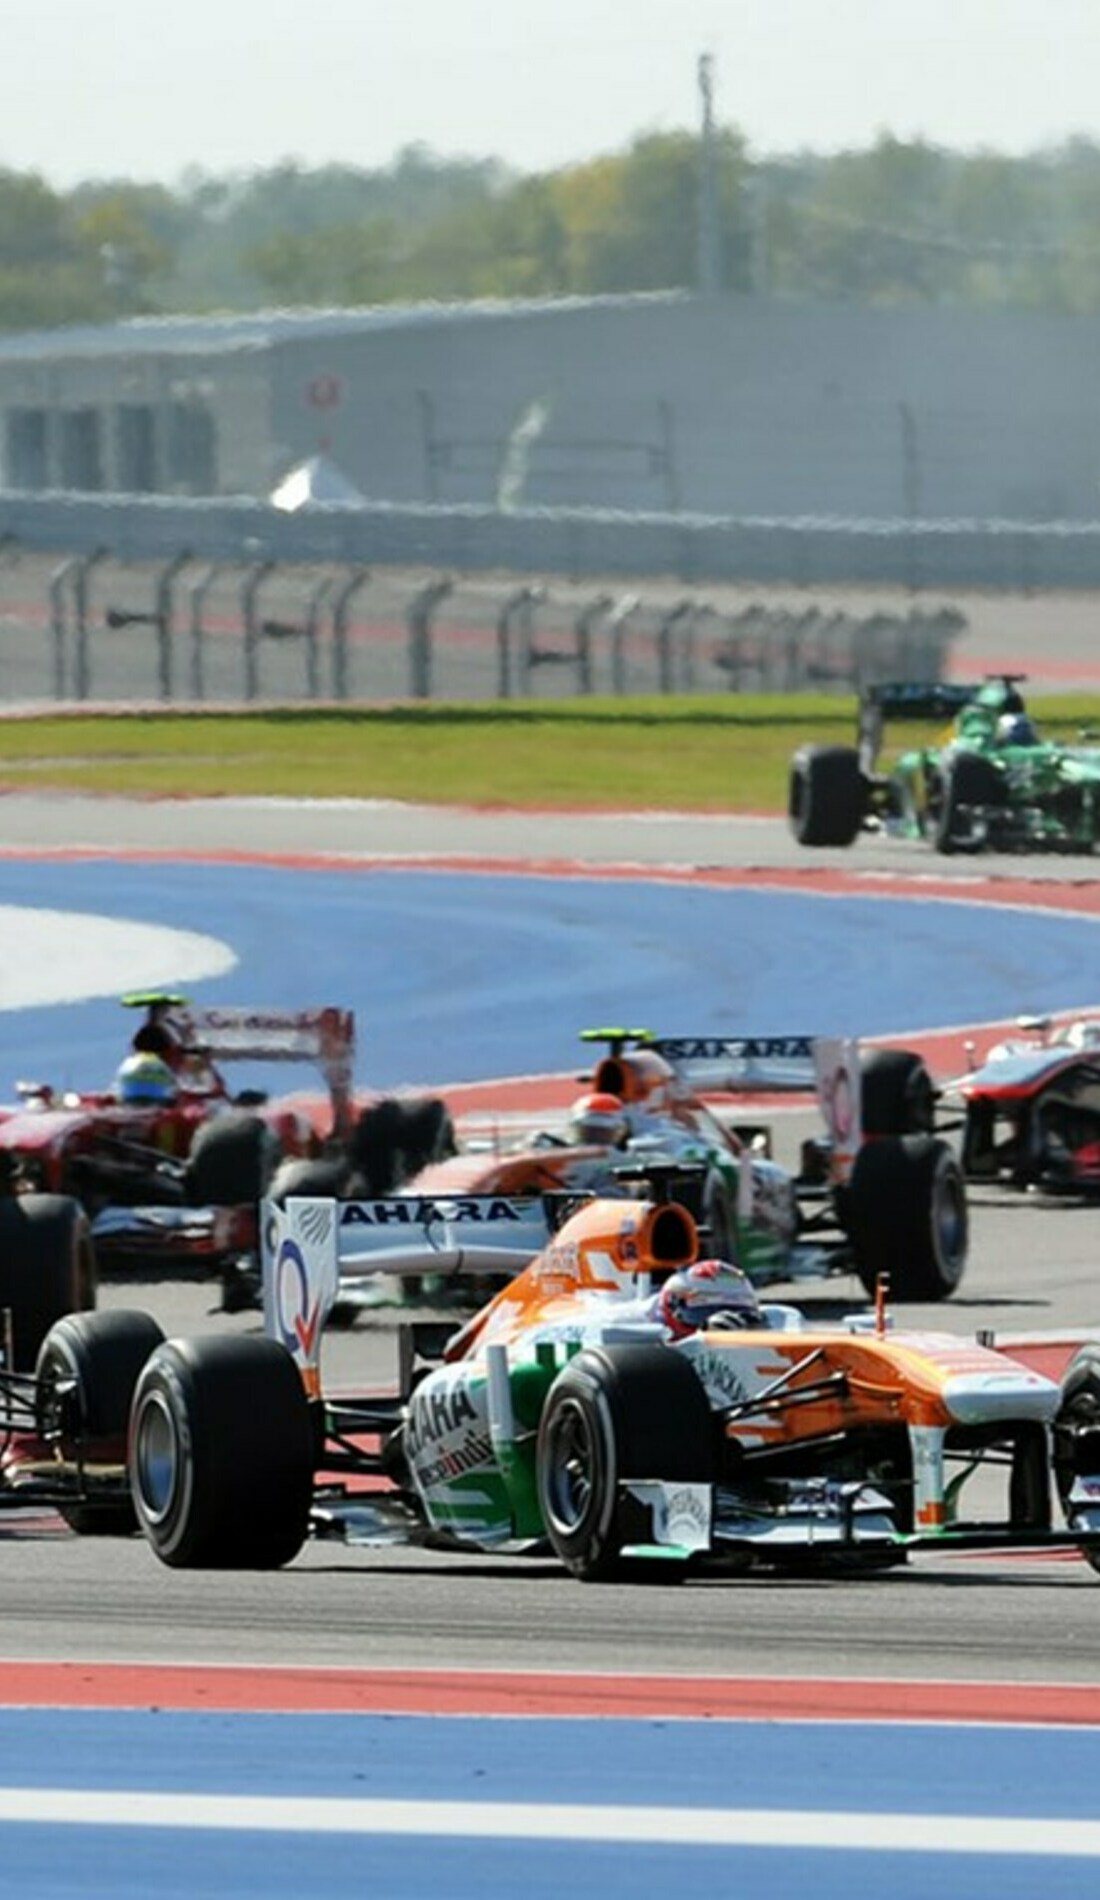 A Formula 1 United States Grand Prix live event